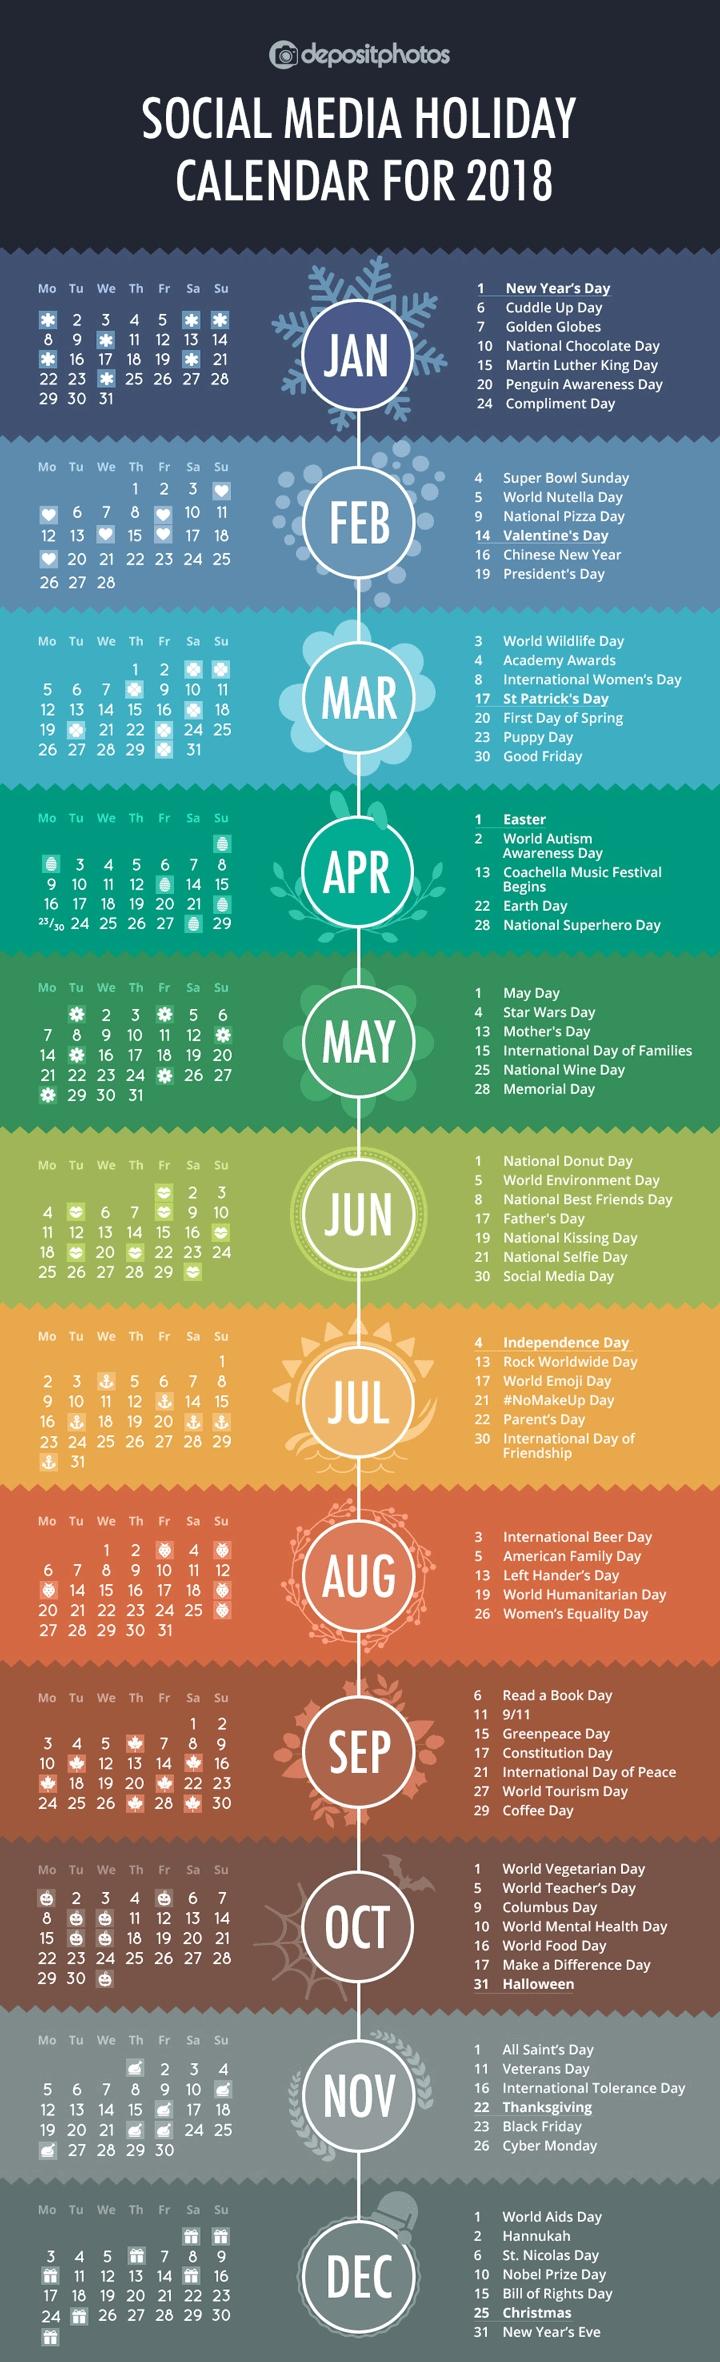 100+ Social Media Holidays You Need In 2020-21: Indispensable!-Printable Healthcare Awareness Calendar 2021